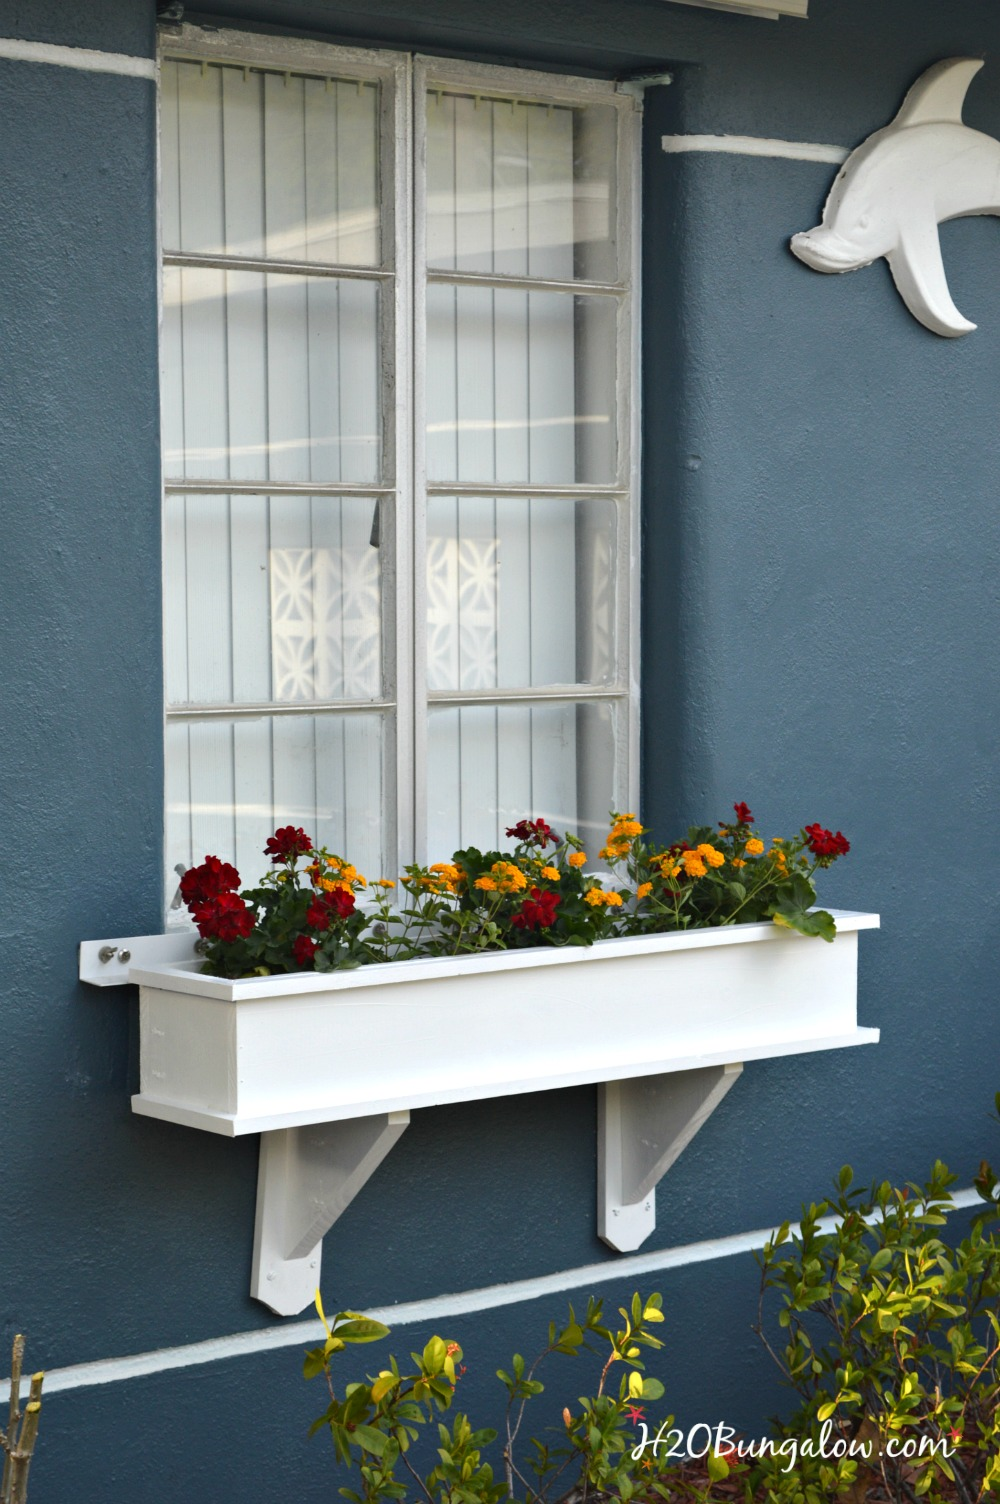 How To Build A Flower Box Planter Tutorial H20bungalow